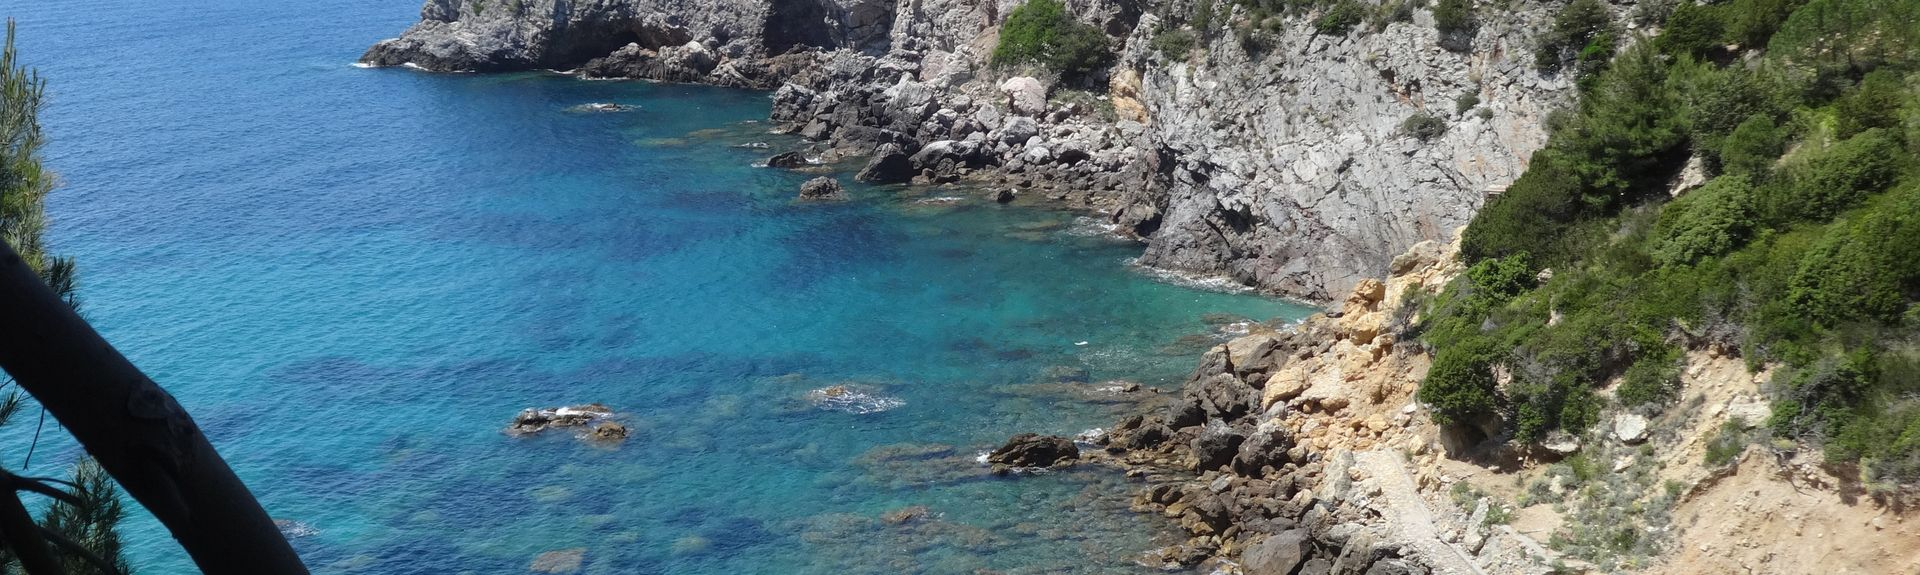 WWF Oasis of Lake Burano, Capalbio, Italy